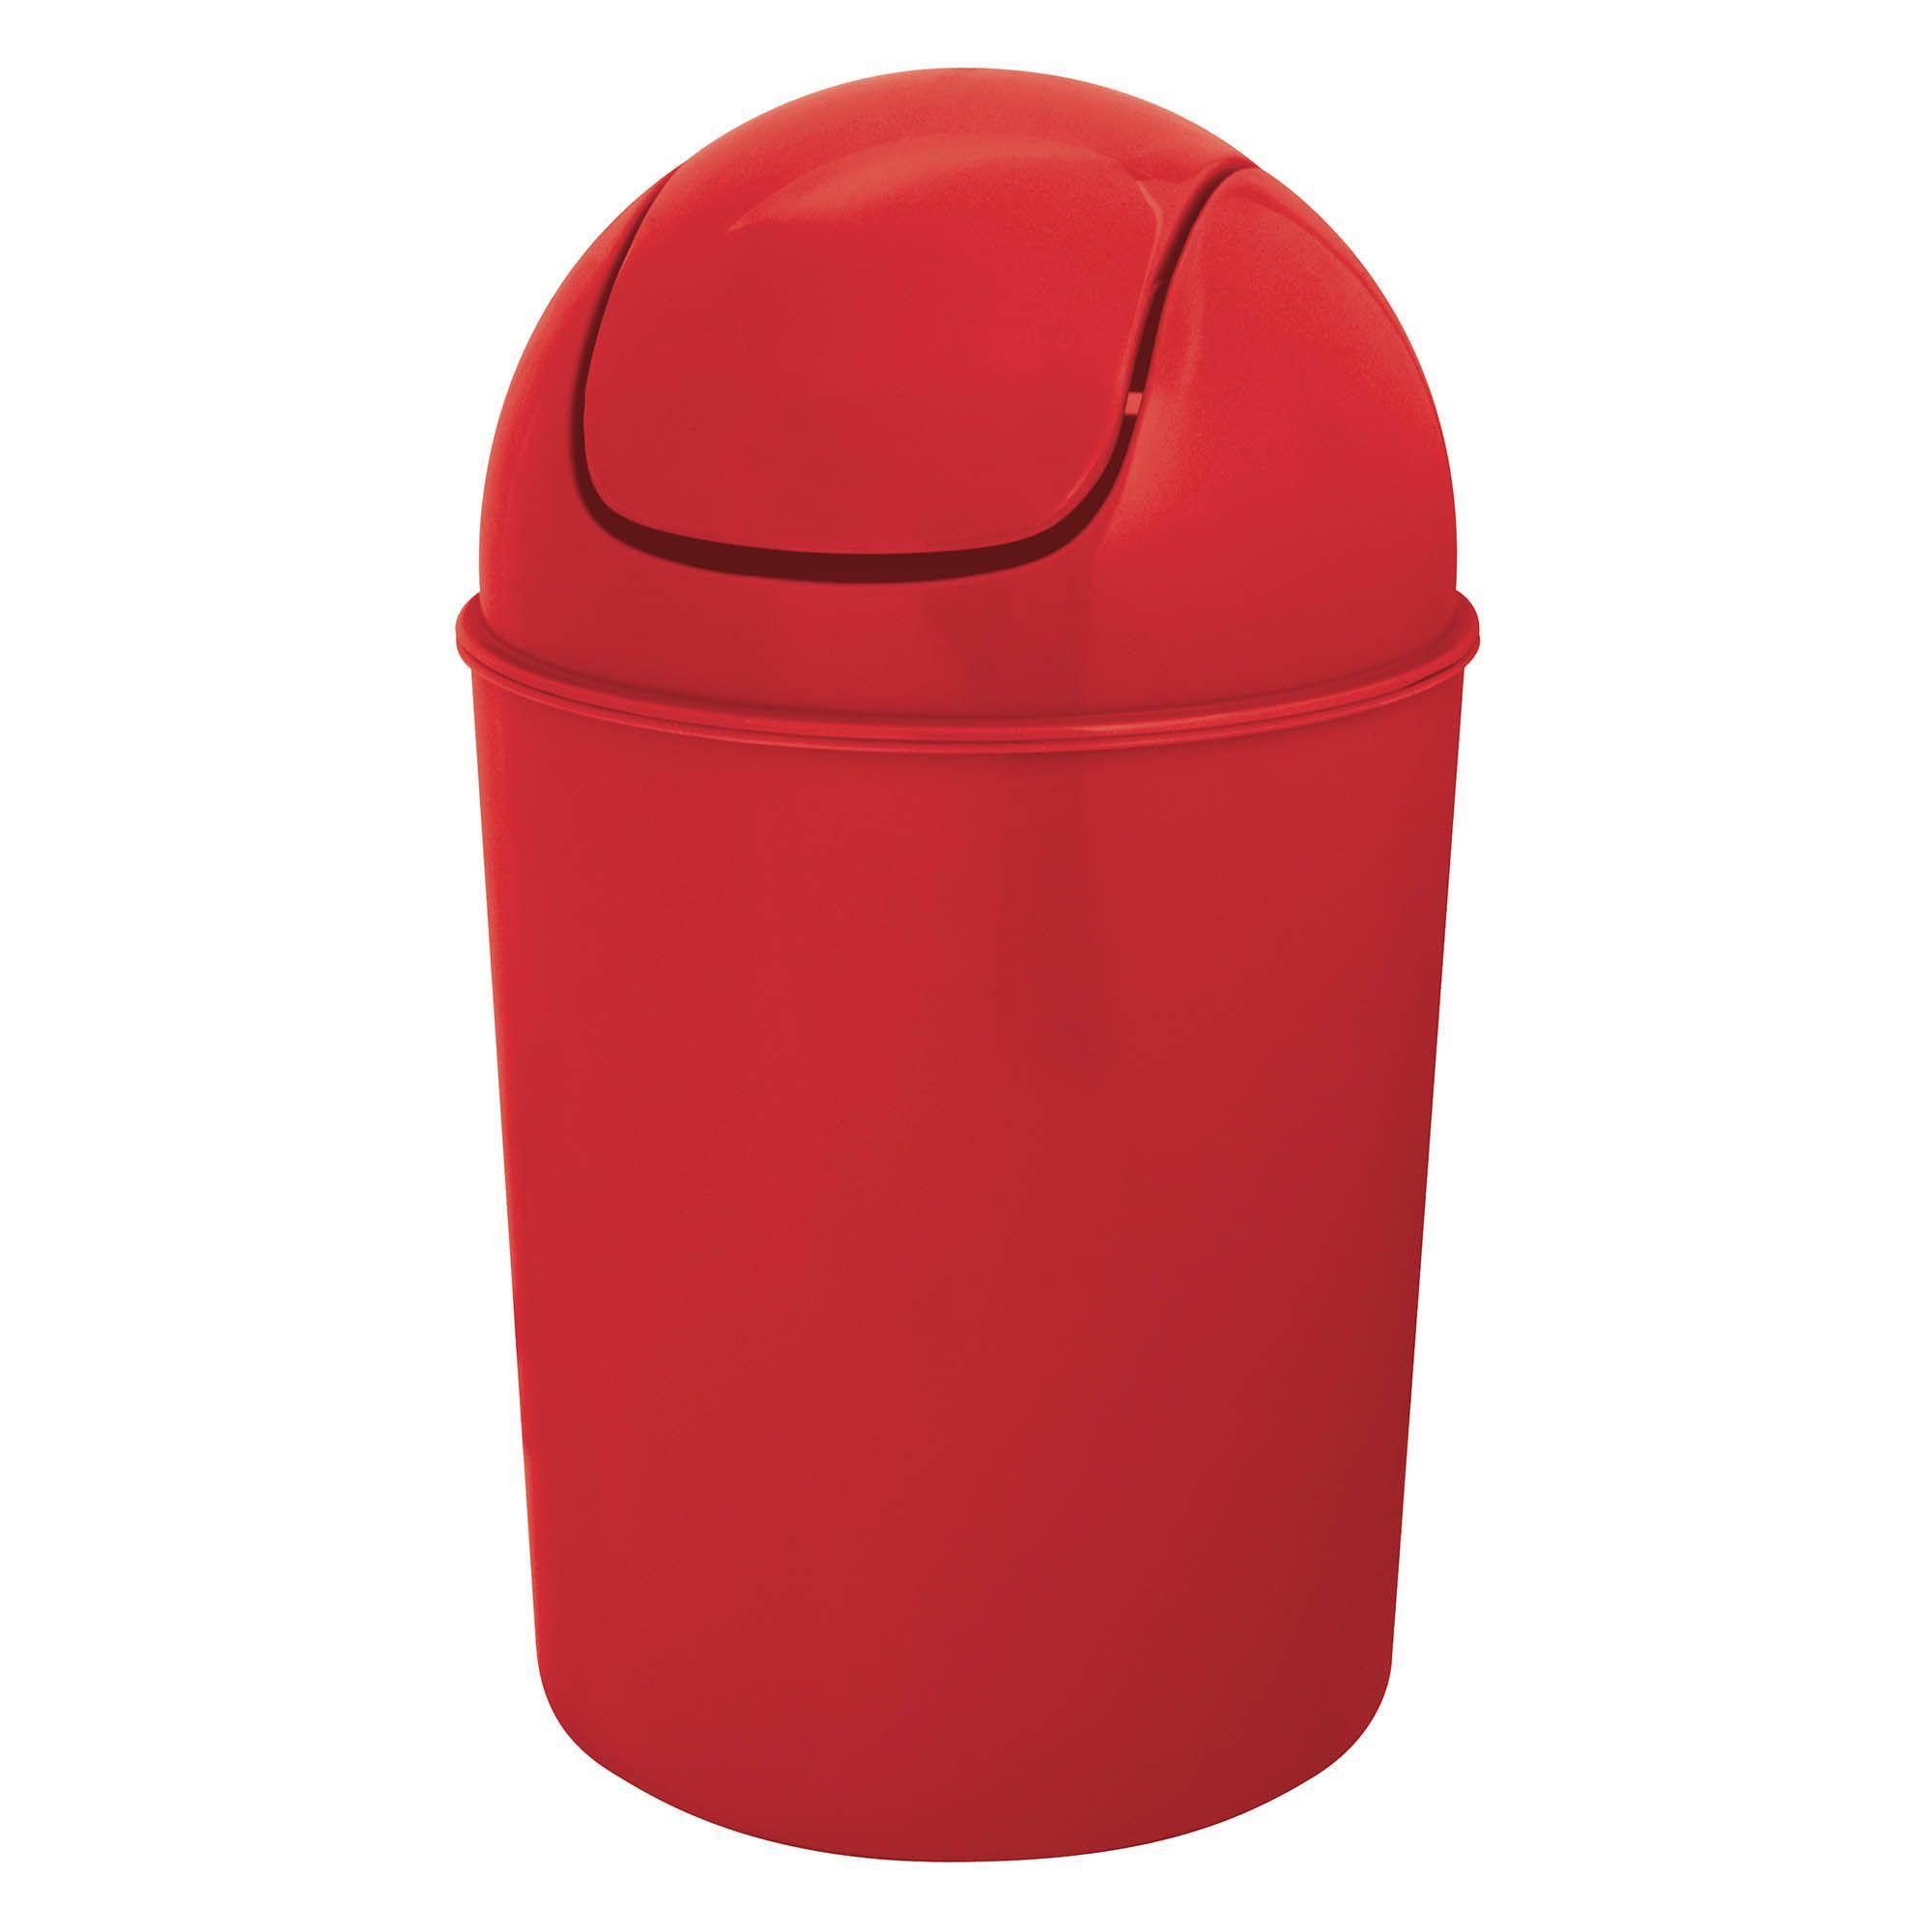 Flip top red plastic bathroom bin 5l departments diy for Red bathroom bin